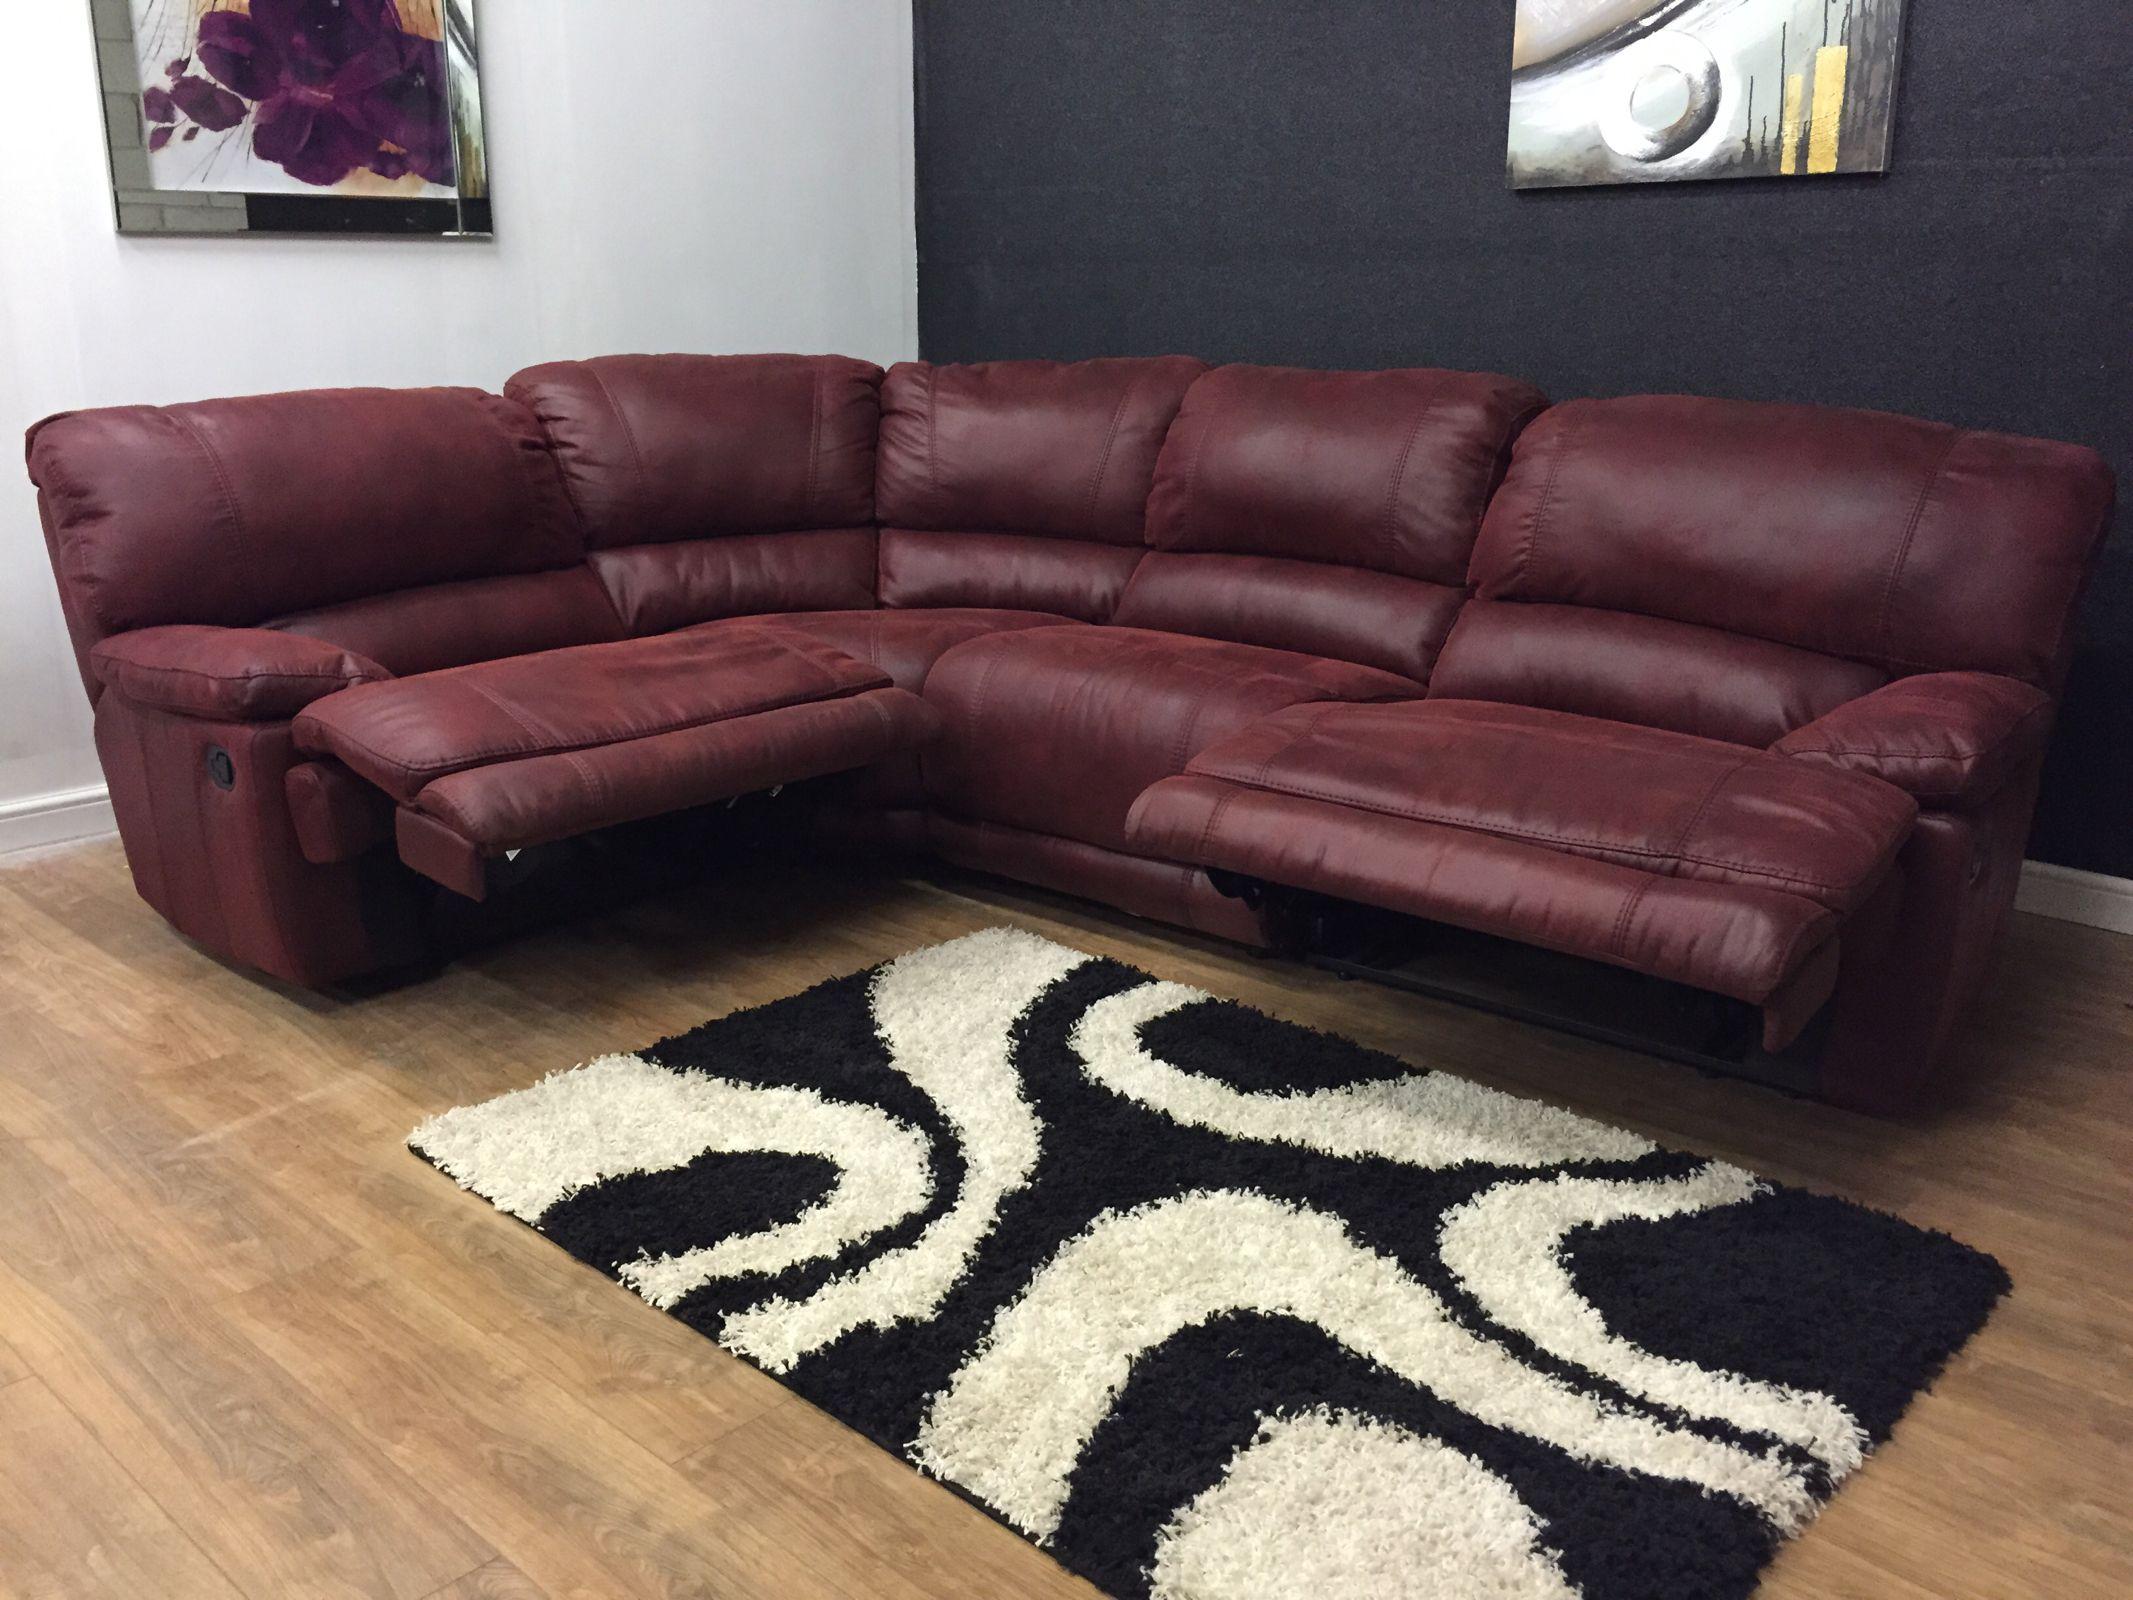 Harveys guvnor fabric corner reclining HOMES 2 FURNISH